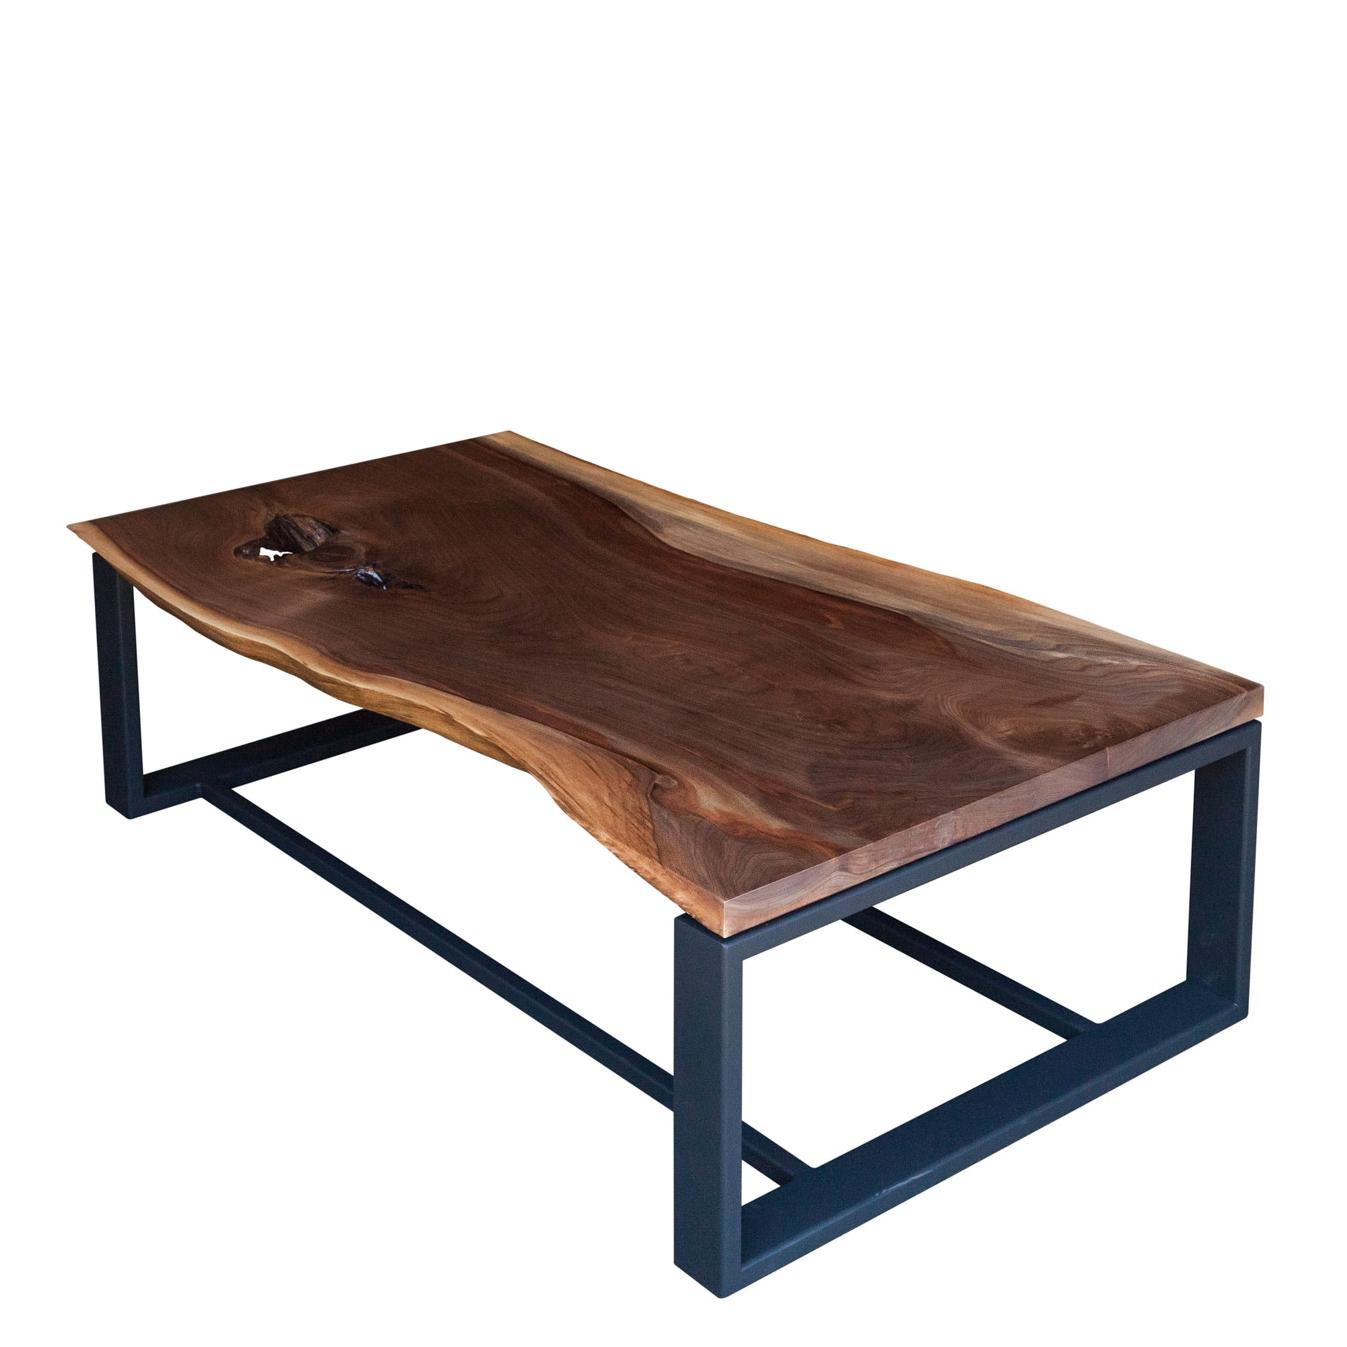 Walnut coffee table live edge furniture by elko hardwoods luxury walnut coffee table geotapseo Gallery